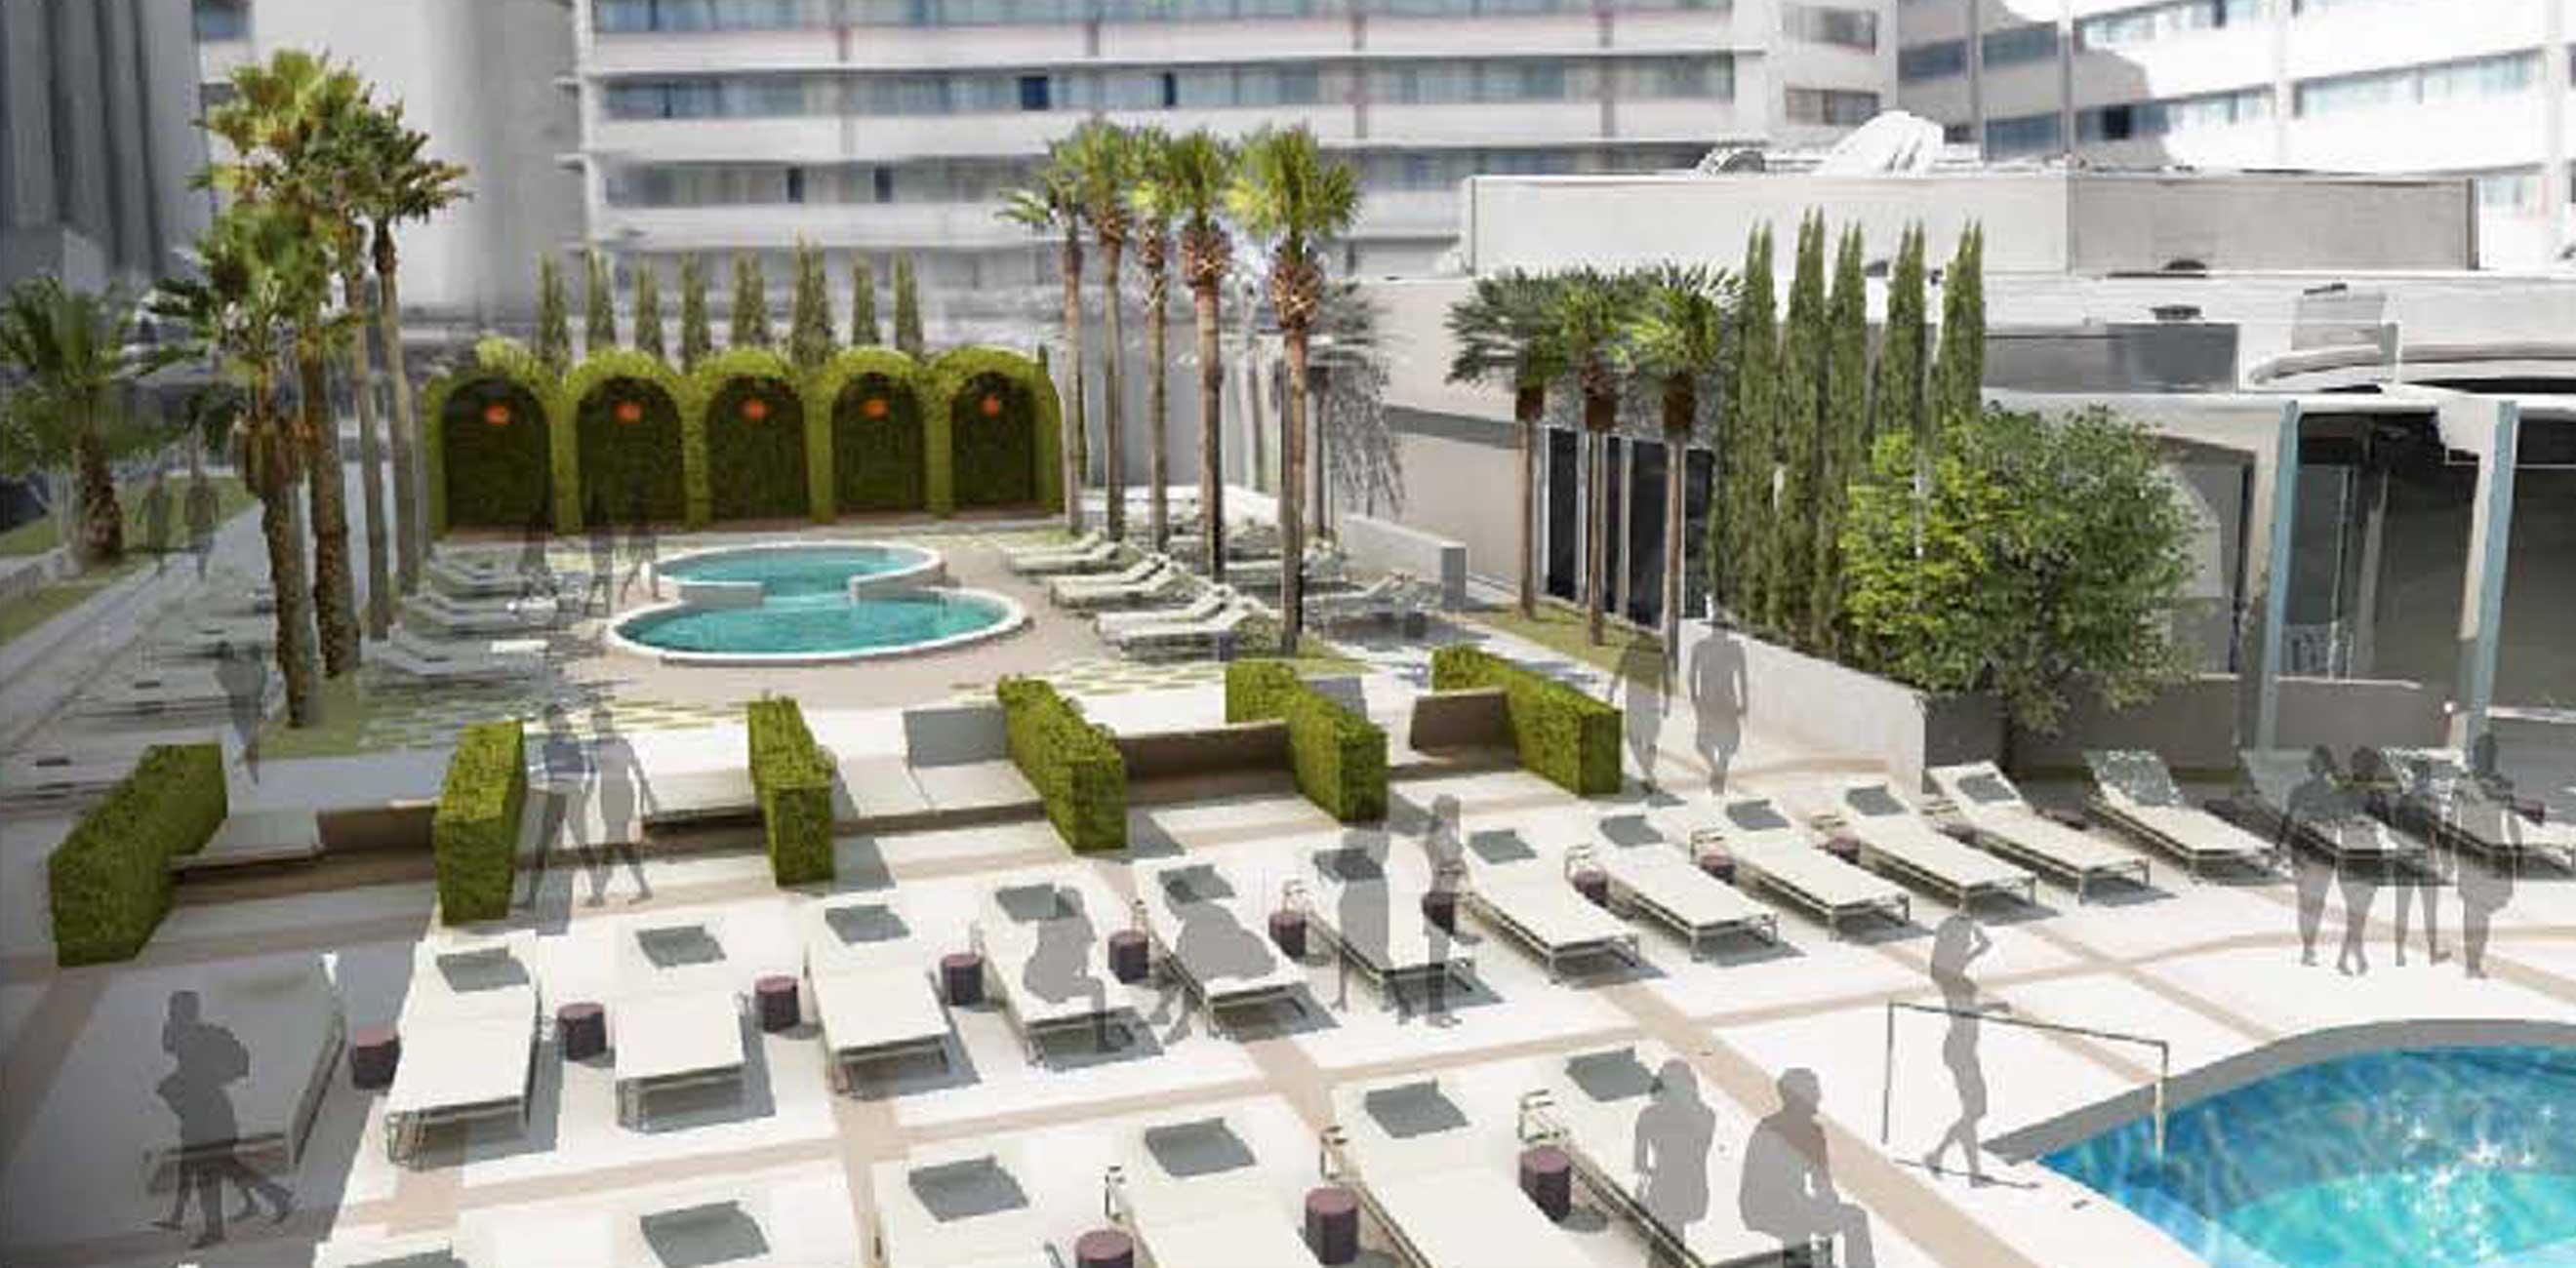 Riviera hotel las vegas landlab for Riviera resort las vegas